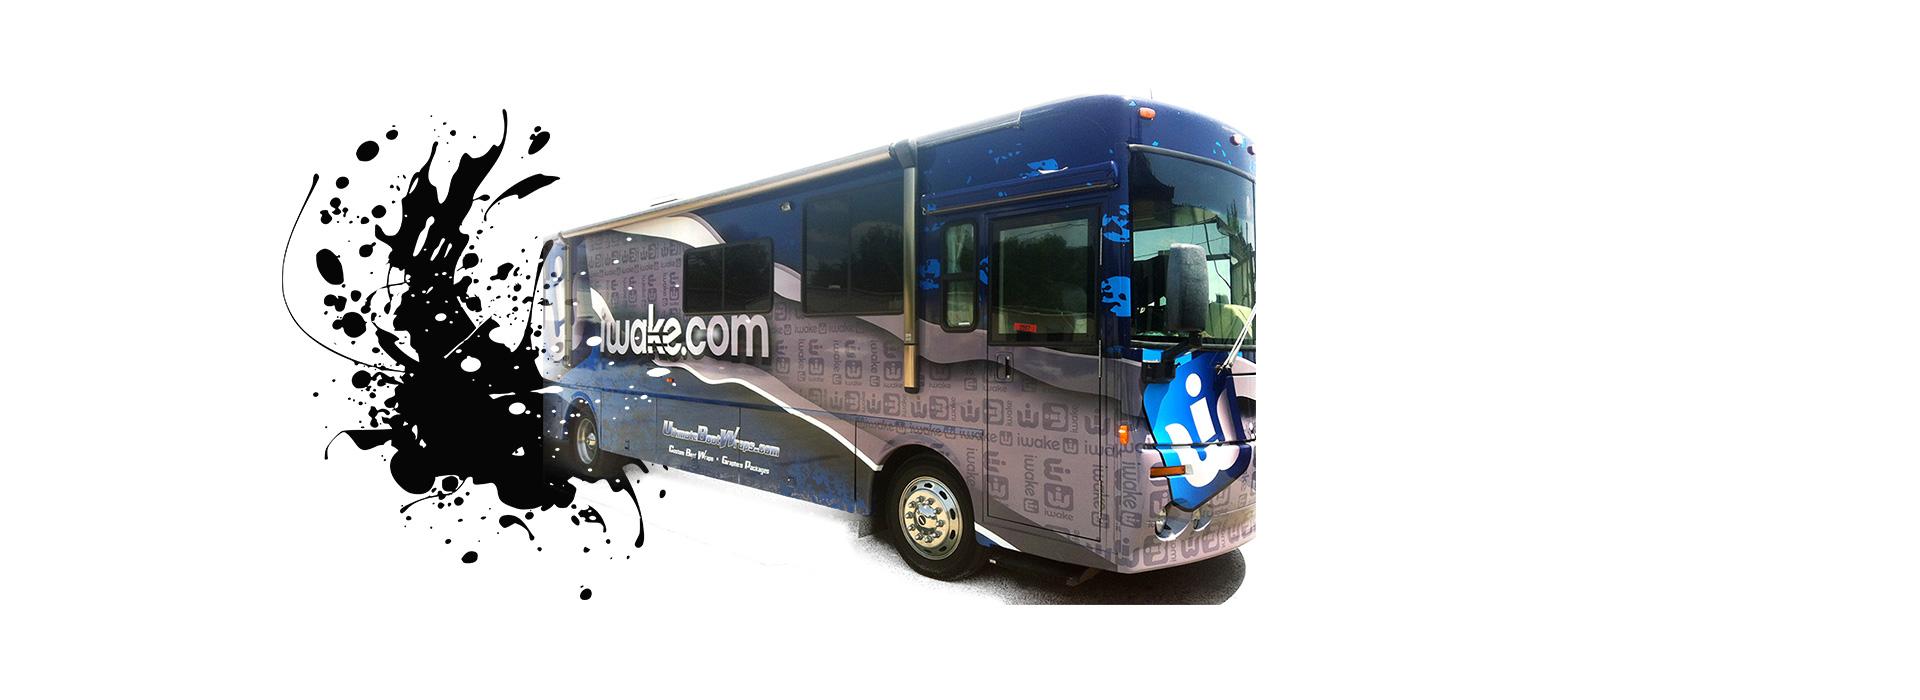 Custom Vehicles Orlando